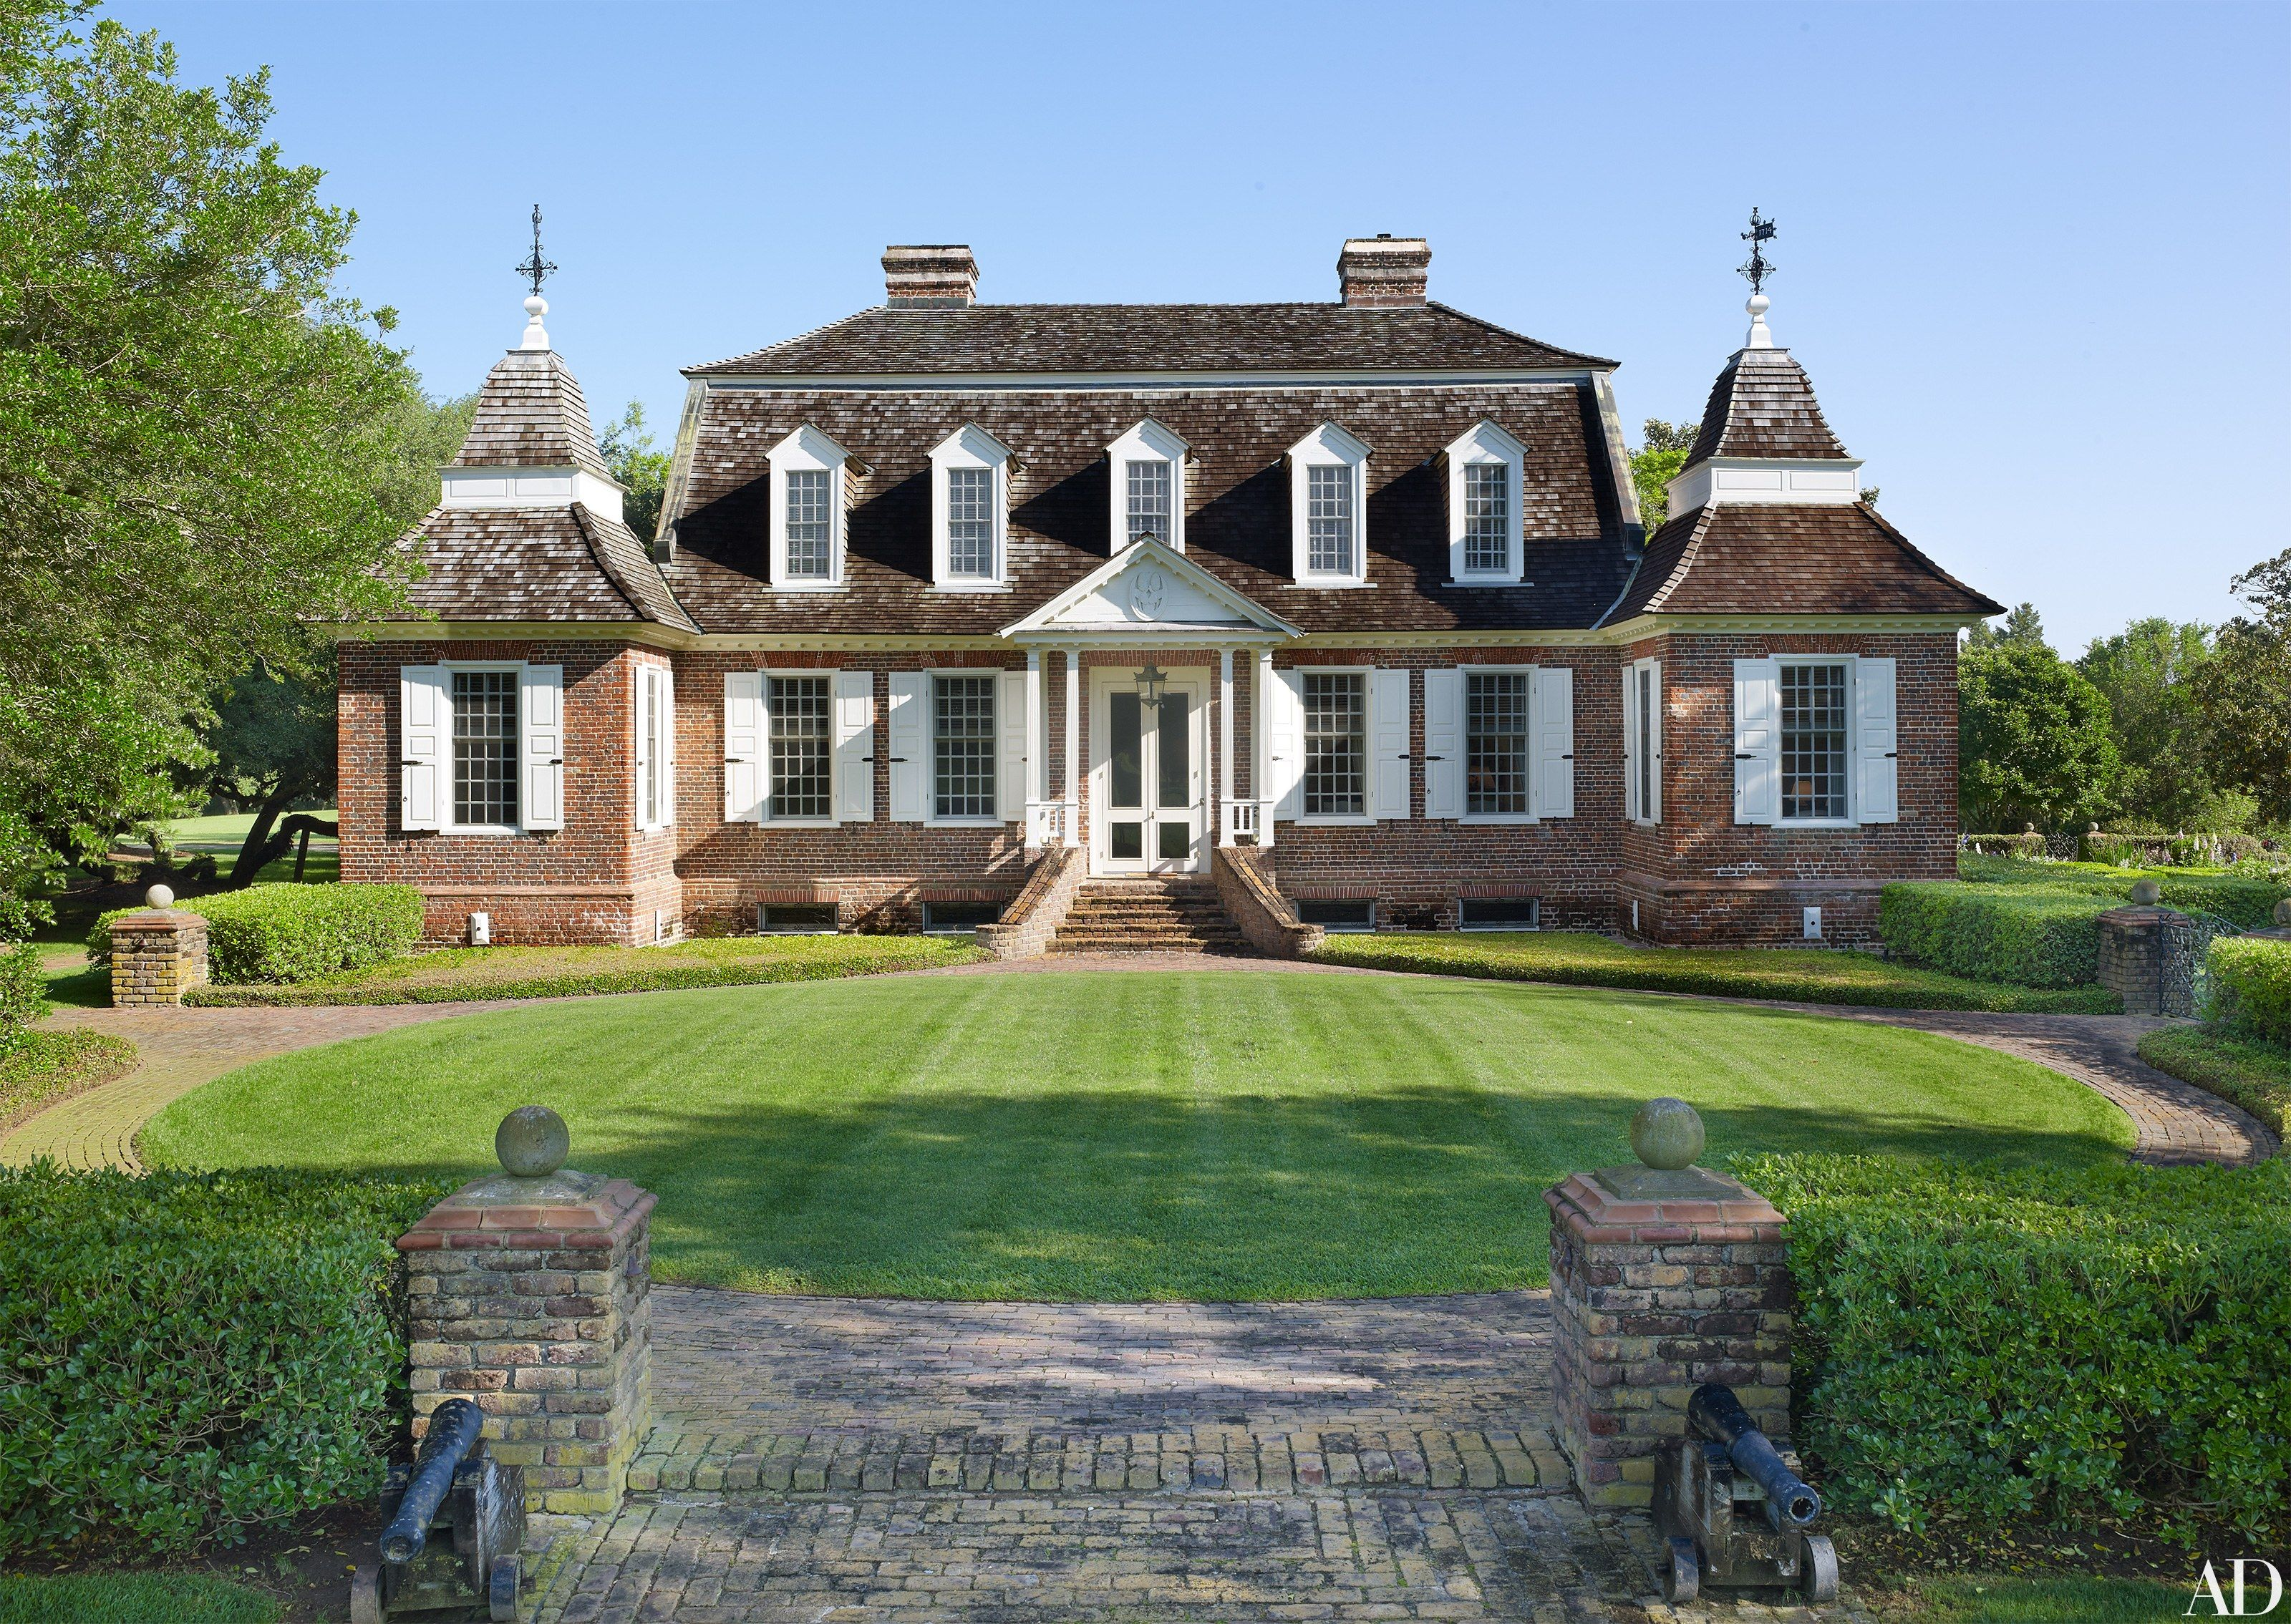 Hom Home go inside a historic south carolina plantation house turned family